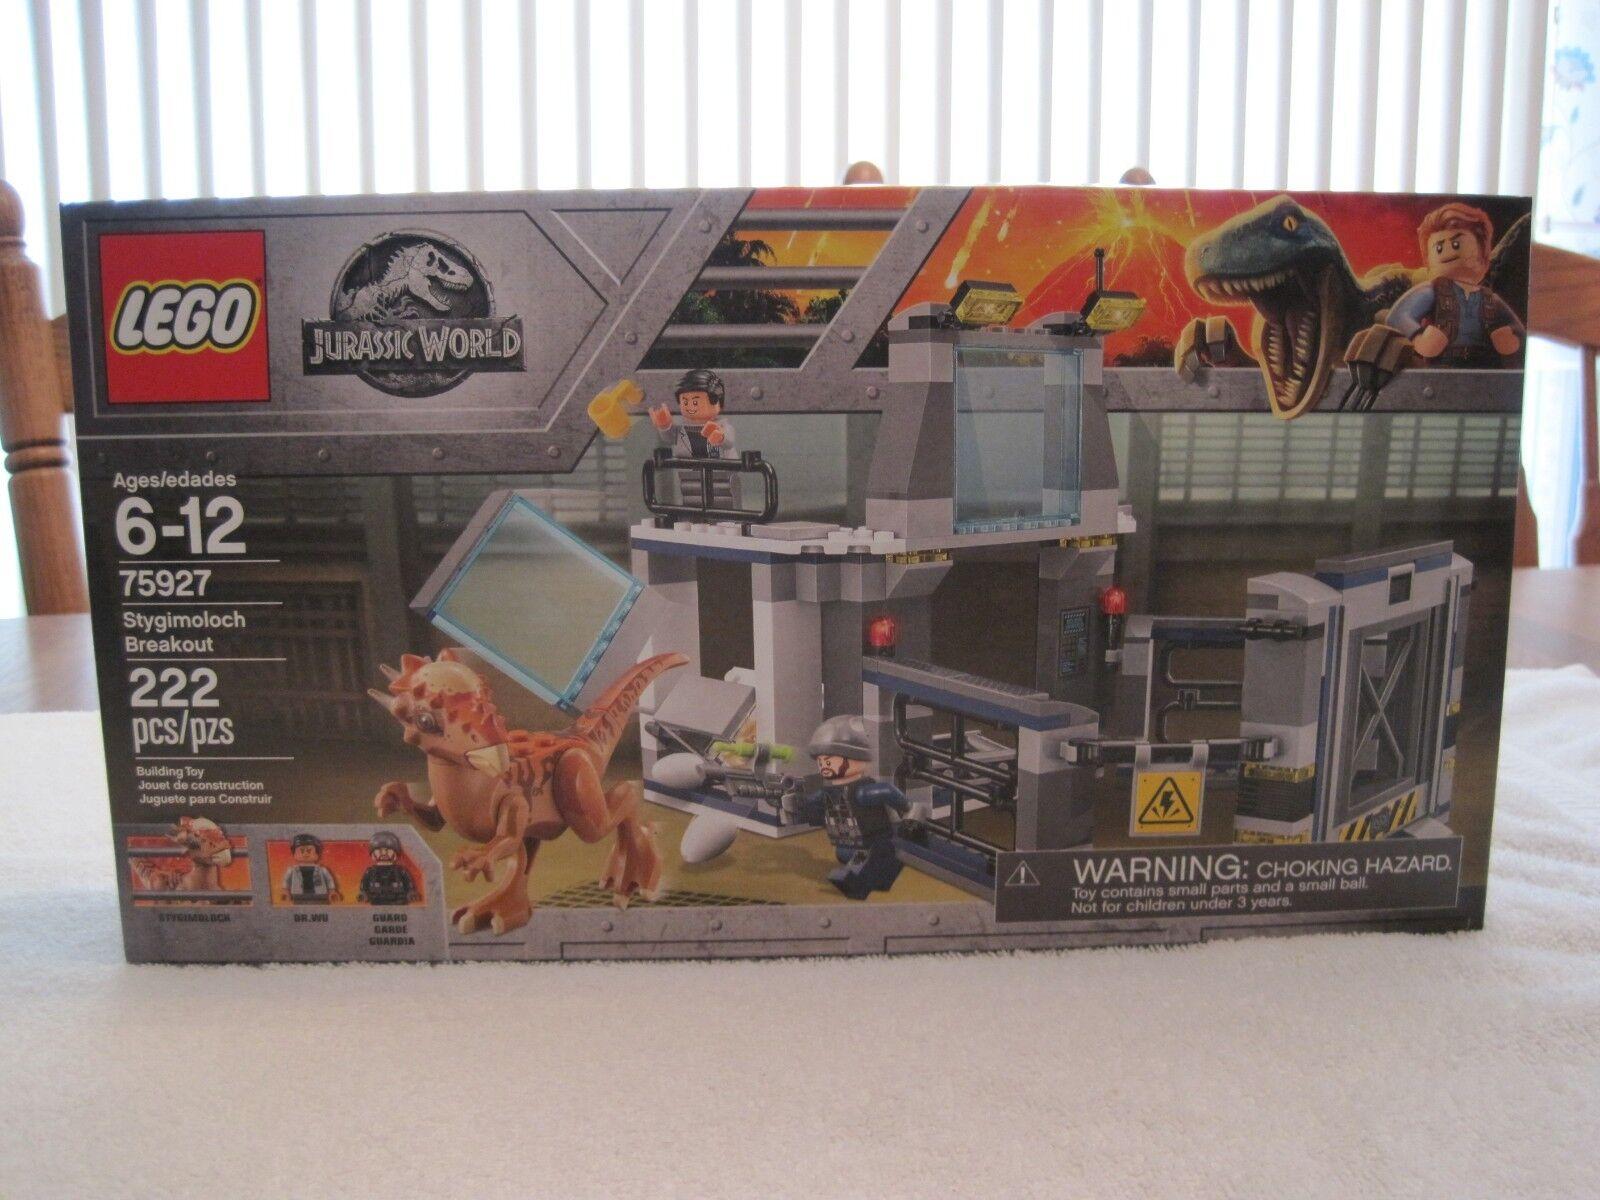 Lego 75927 Jurassic World Stygimoloch Breakout -- Nuevo -- sellado de fábrica